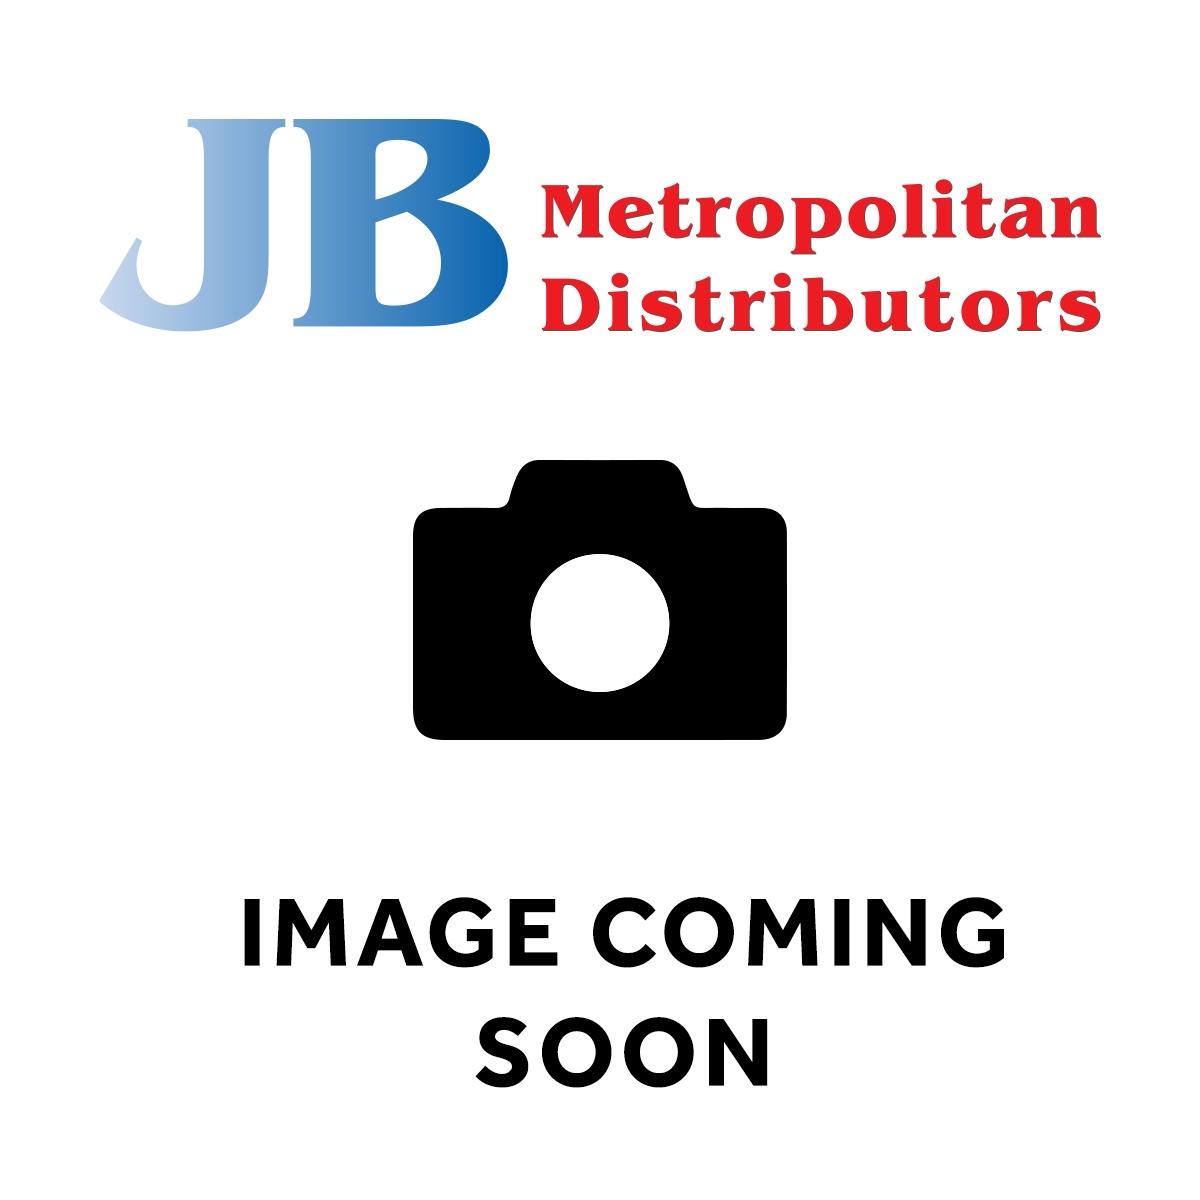 175G SAMBOY BARBEQUE